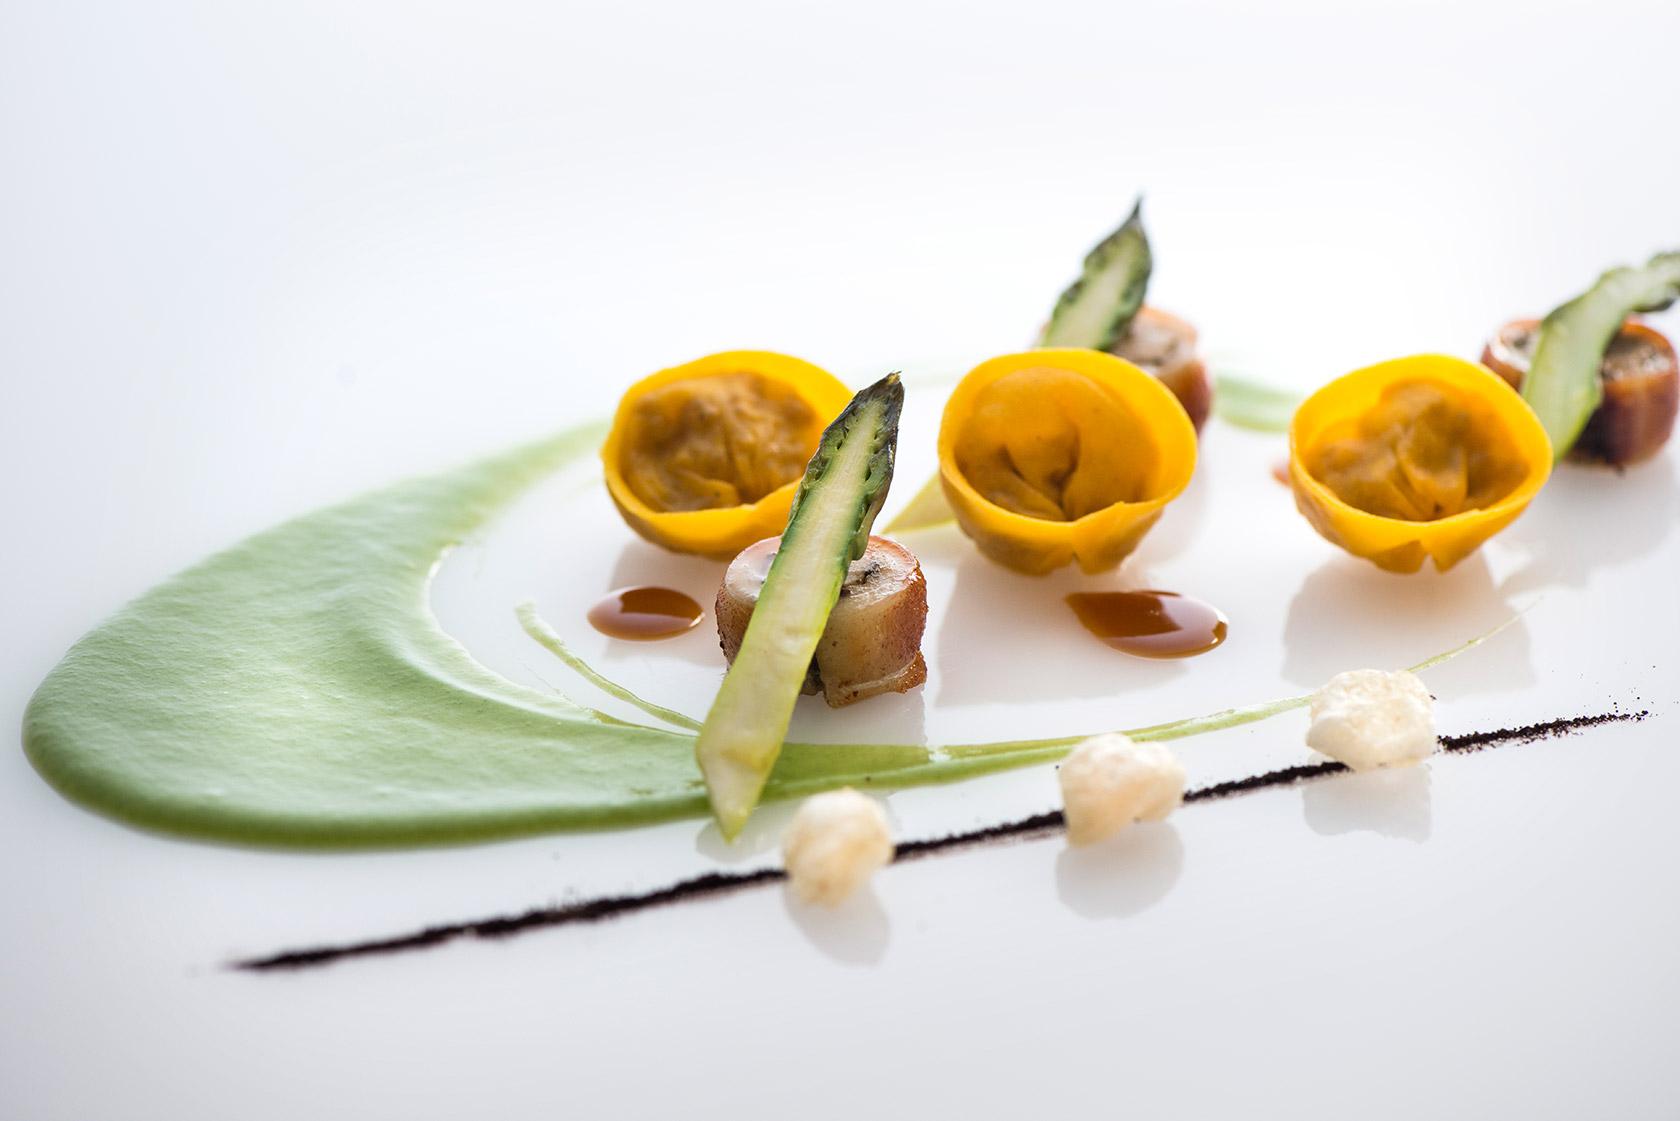 arnolfo-ristorante-tortelli-asparagi-gaetano-trovato-chef